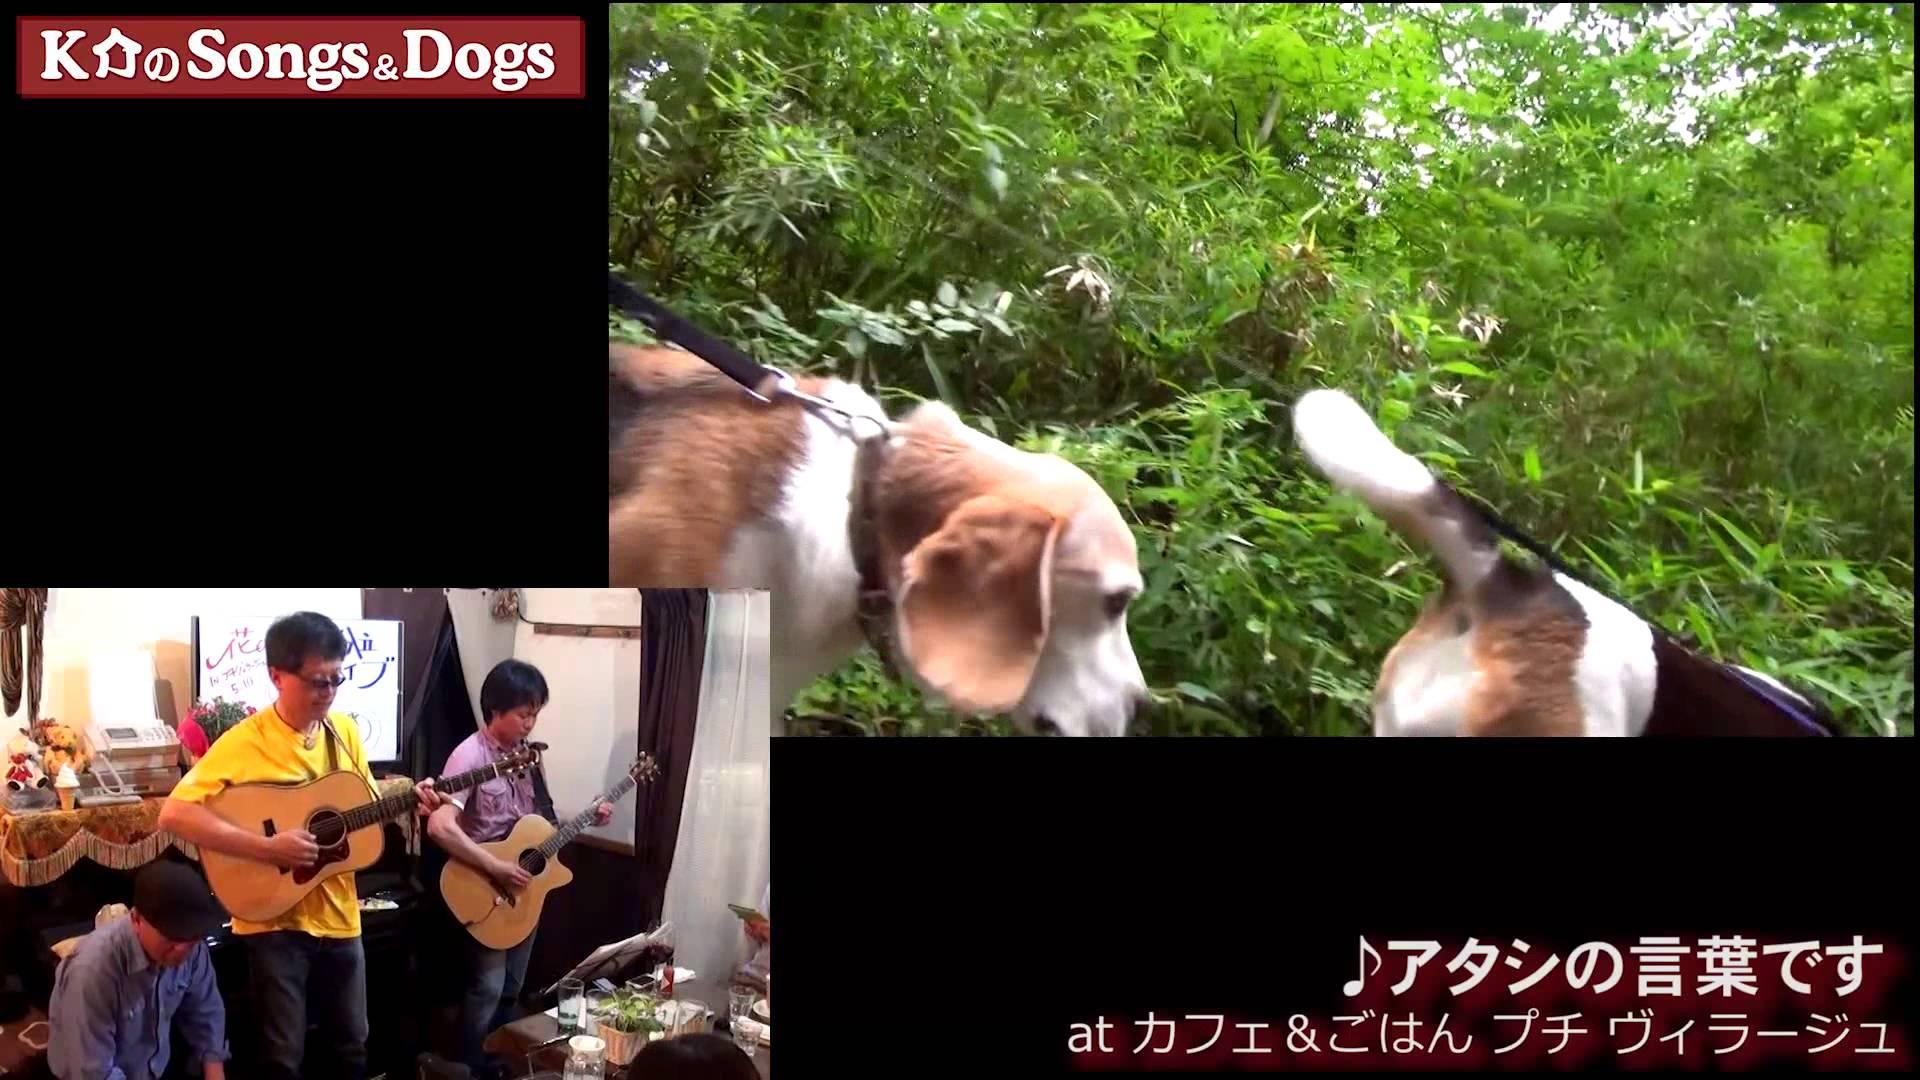 K介のSongs&Dogs週末はミュージシャン75